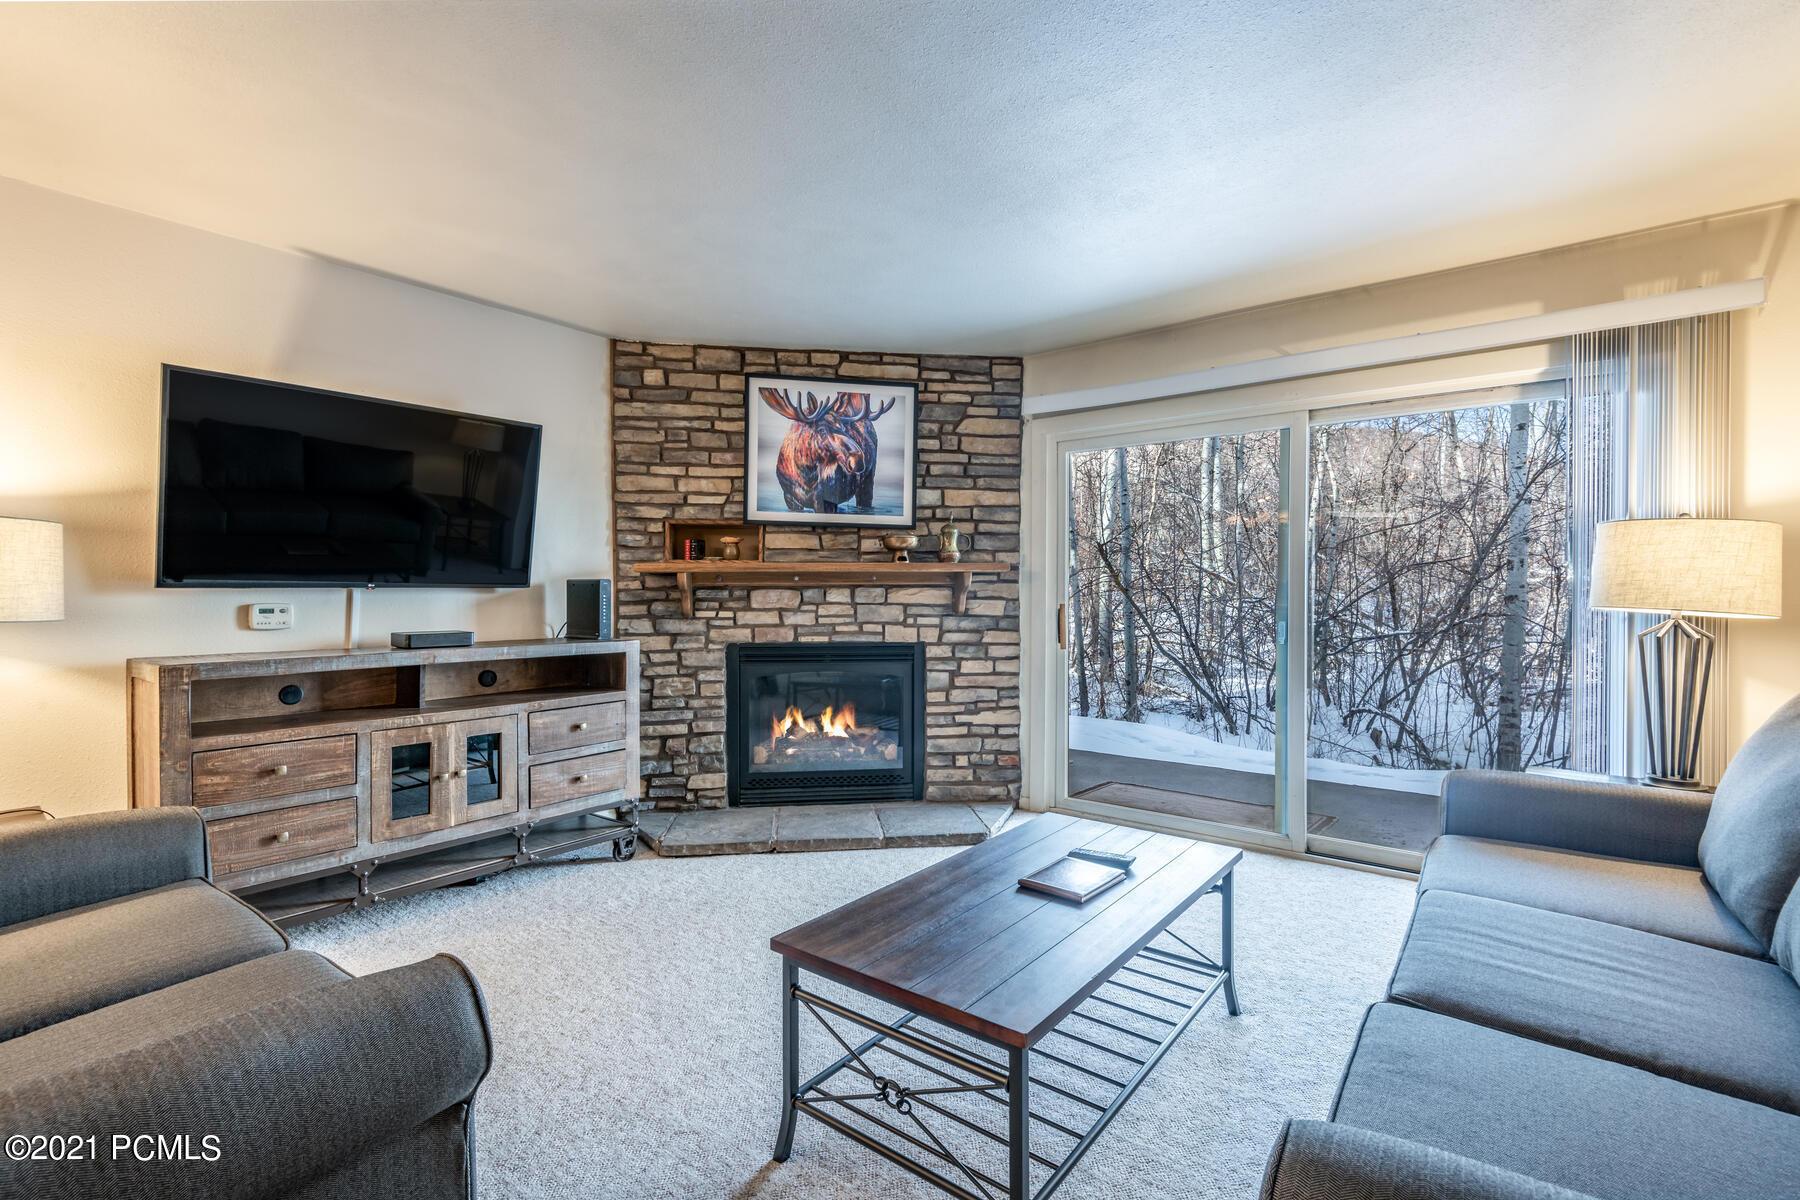 405 Silver King Drive, Park City, Utah 84060, 2 Bedrooms Bedrooms, ,2 BathroomsBathrooms,Condominium,For Sale,Silver King,12100092